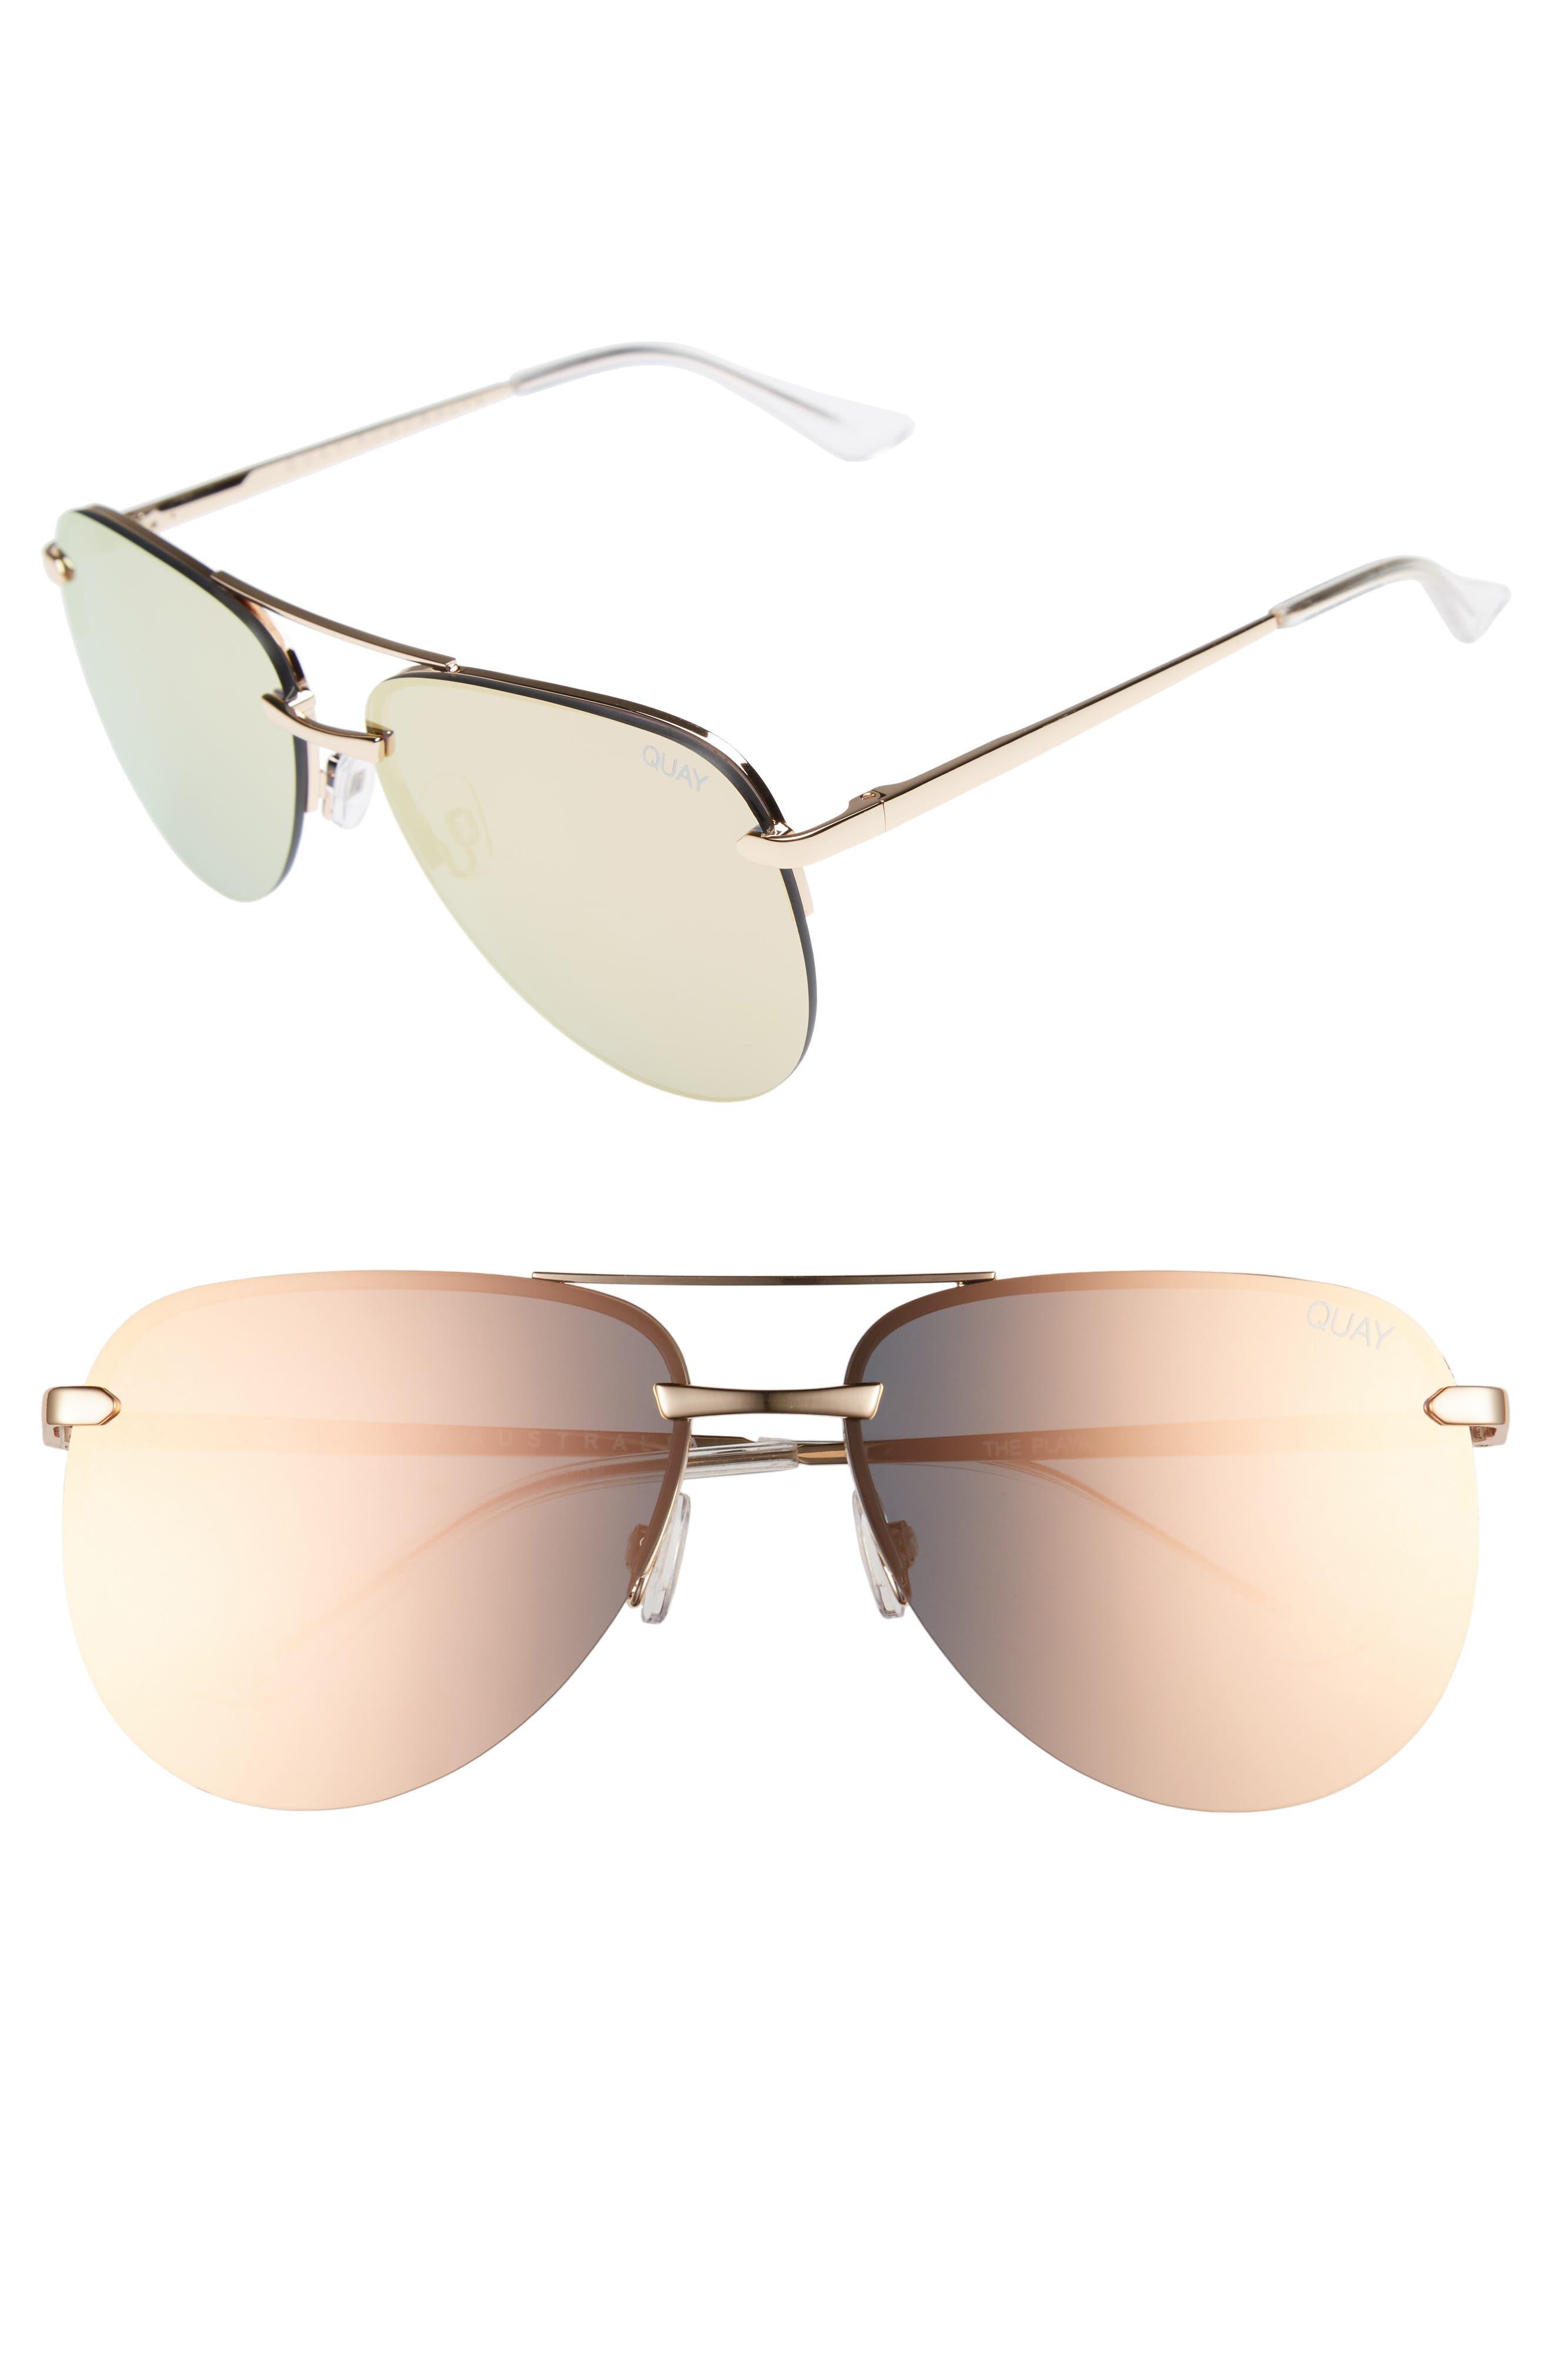 Alternate Image 1 Selected - Quay Australia The Playa 64mm Aviator Sunglasses